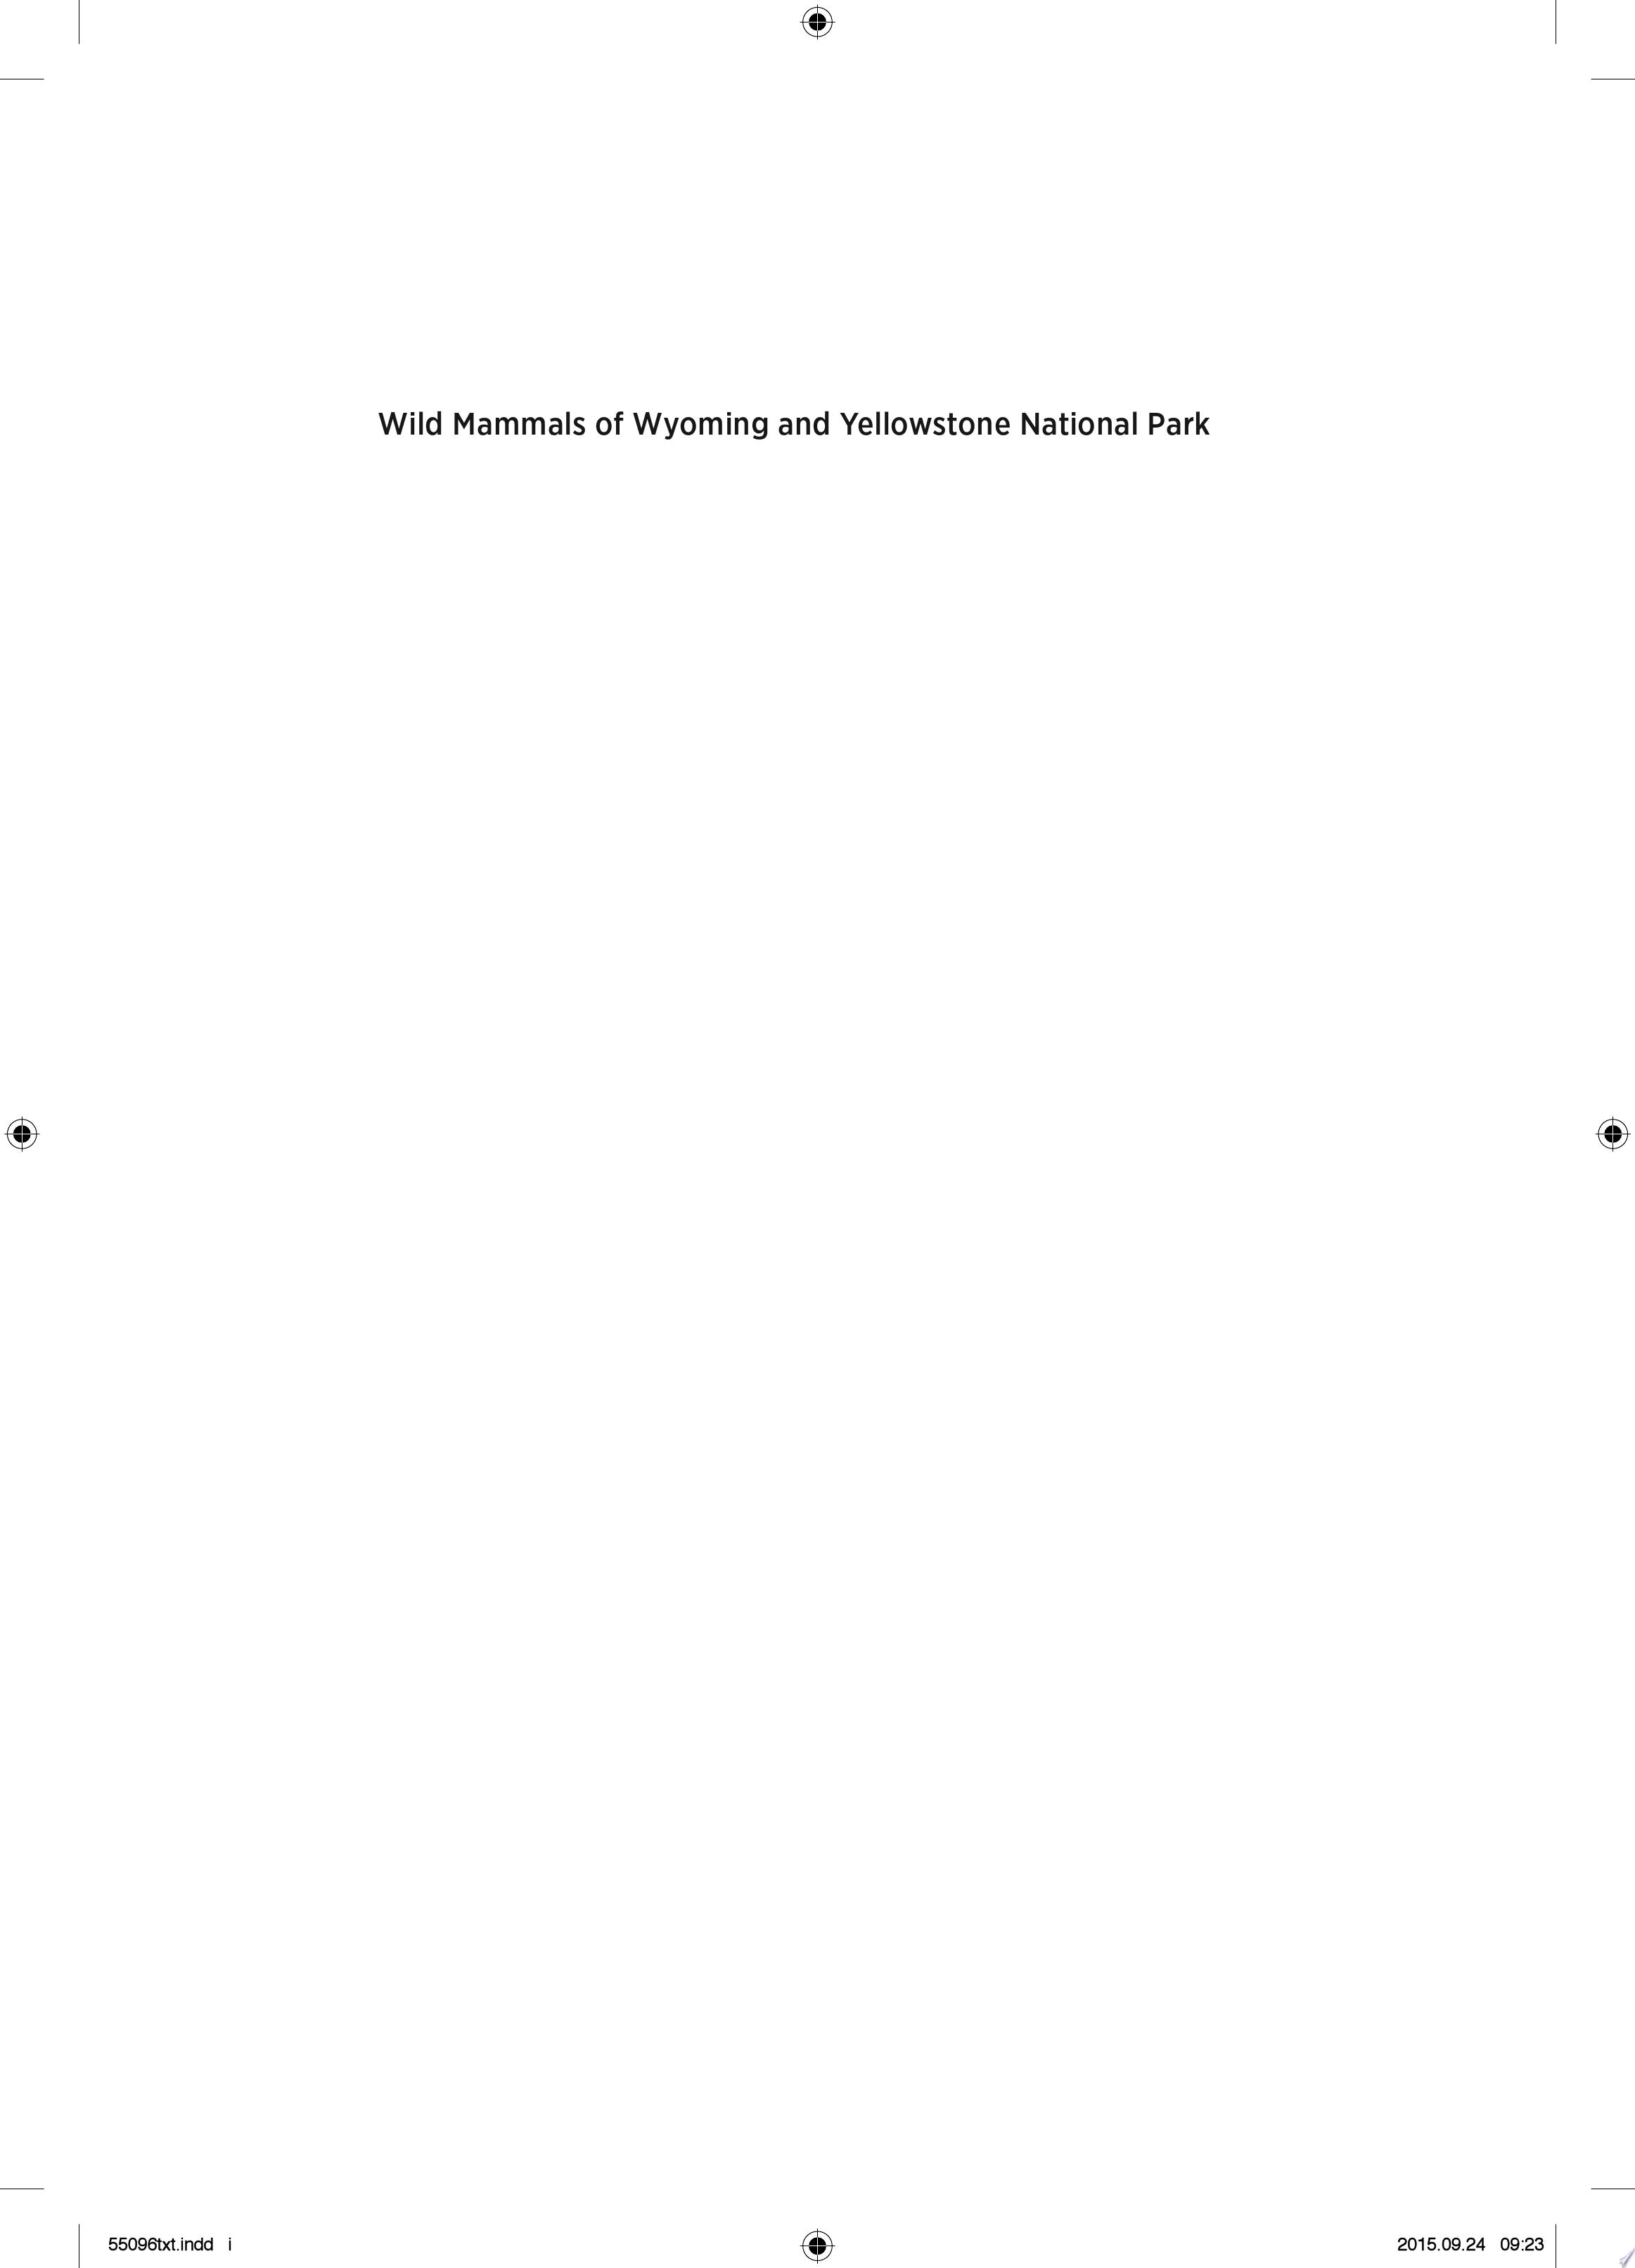 Wild Mammals of Wyoming and Yellowstone National Park